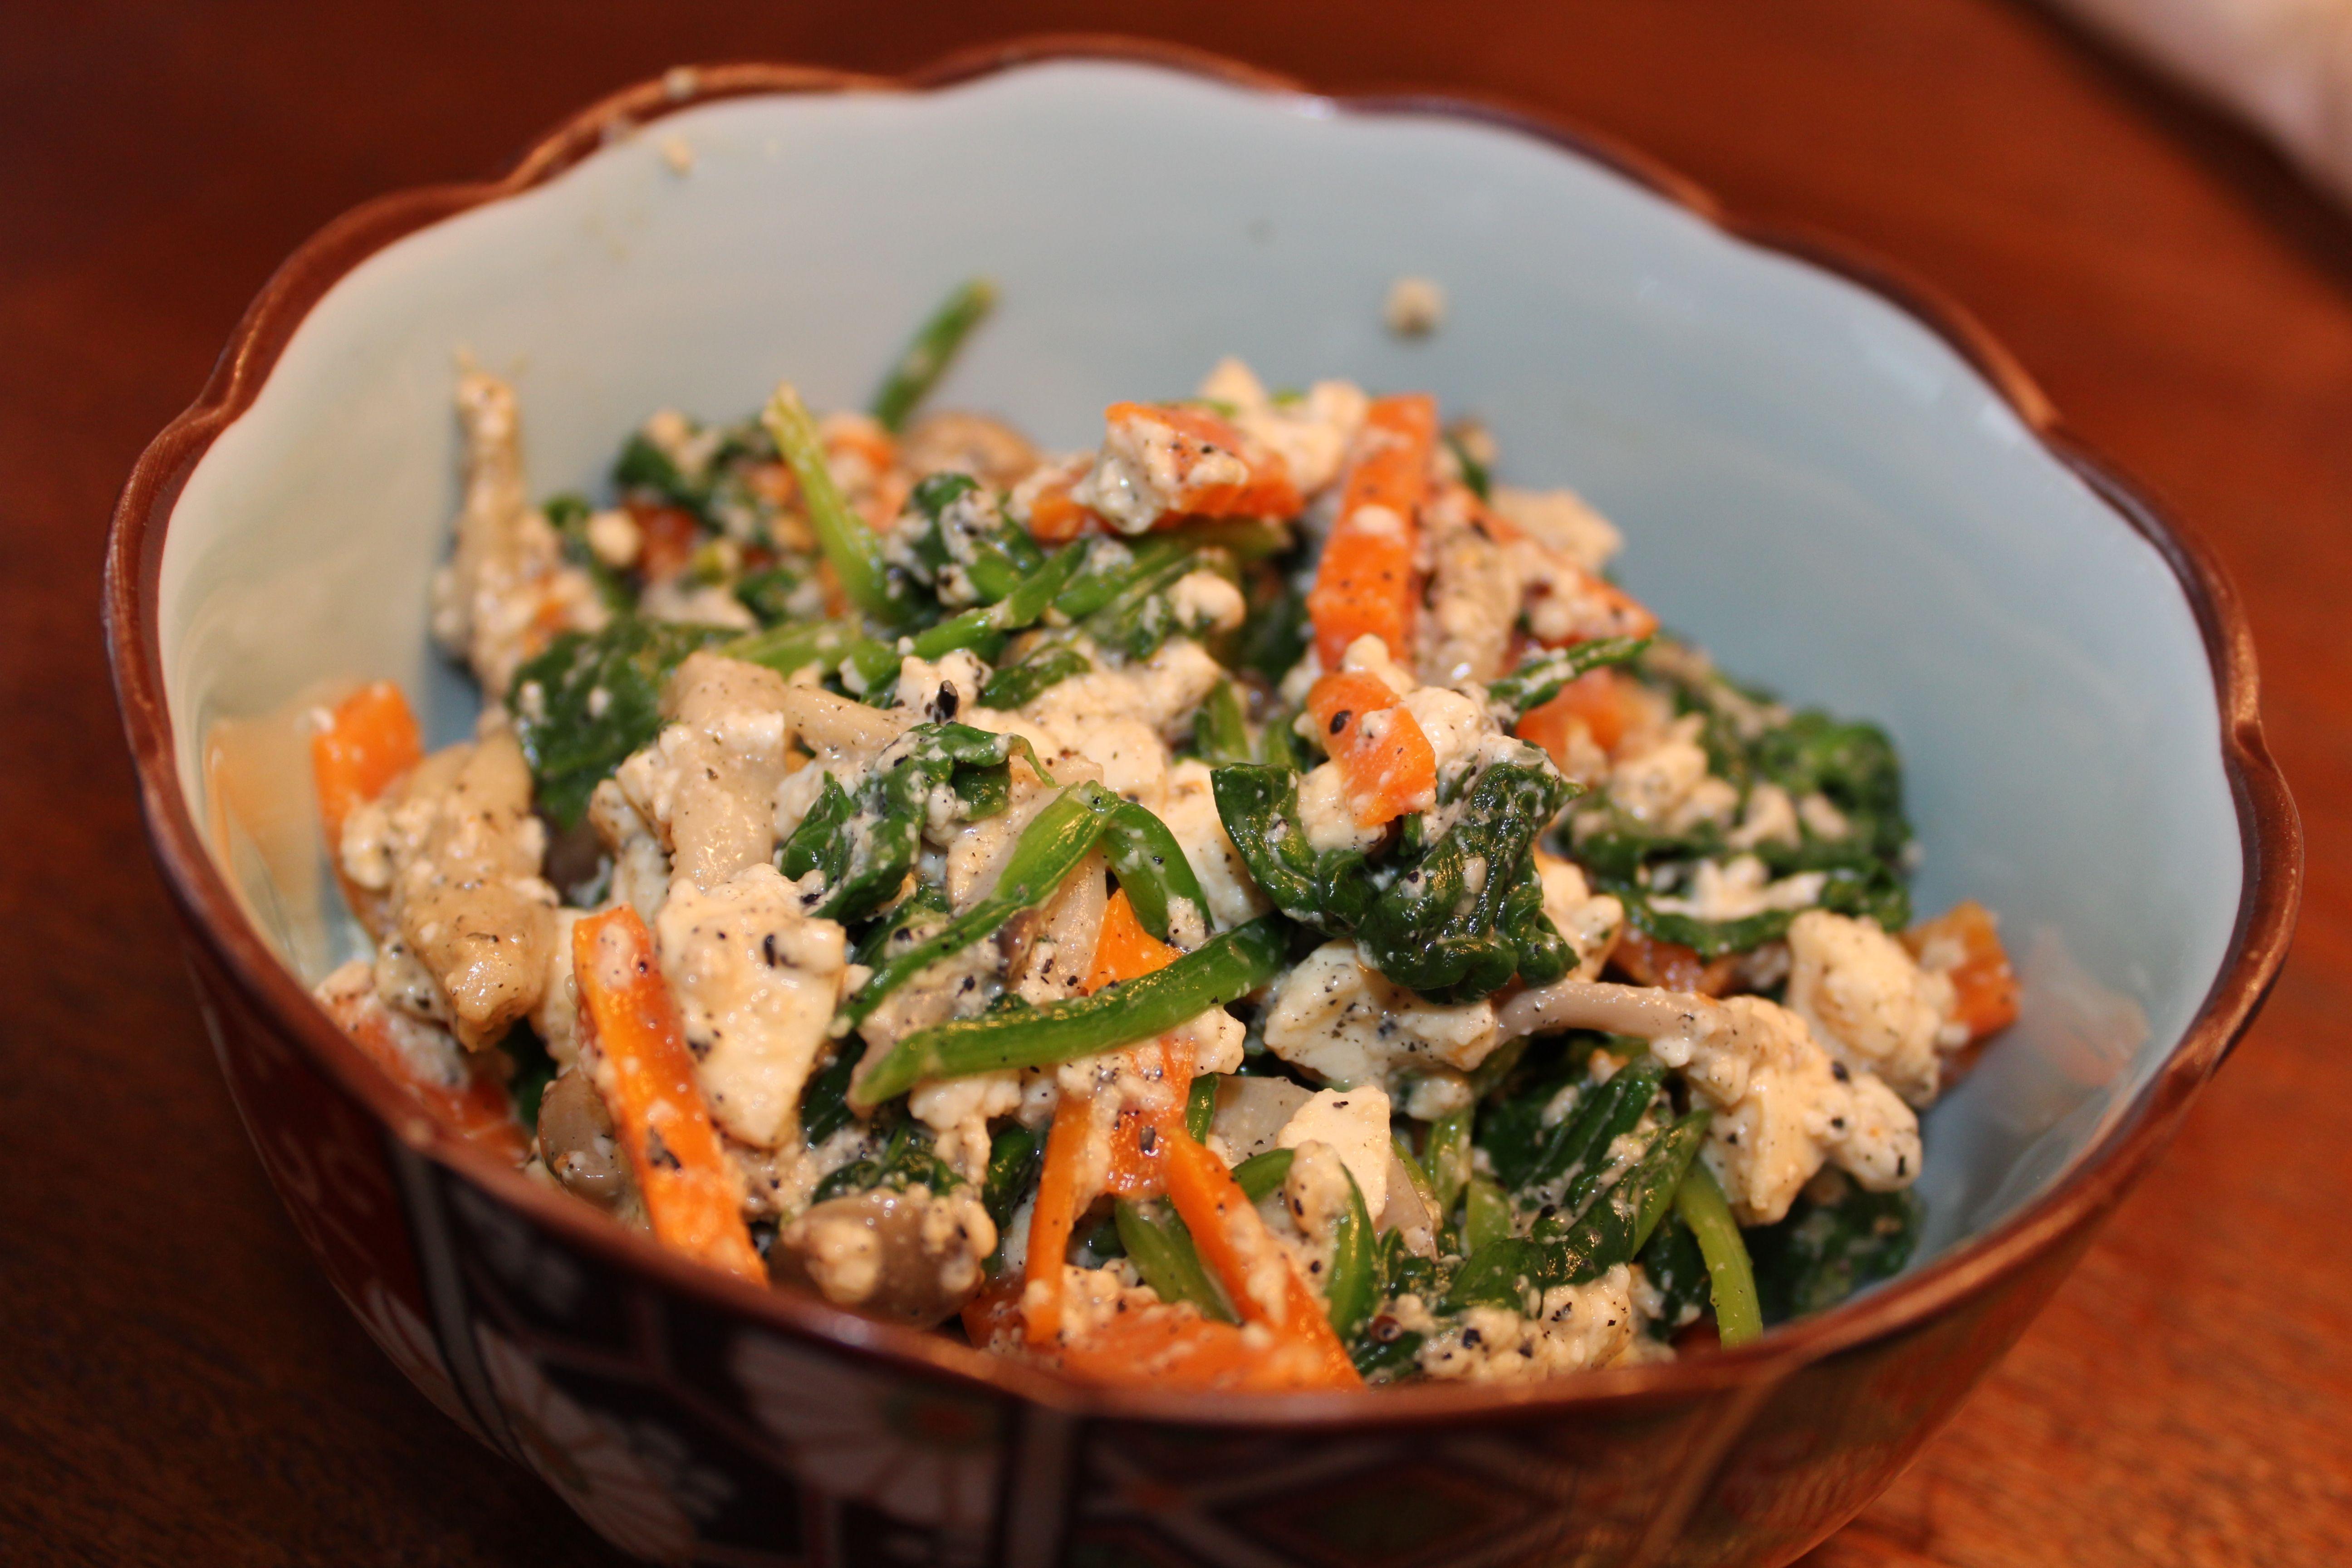 Shiraae-Spinach & Tofu salad